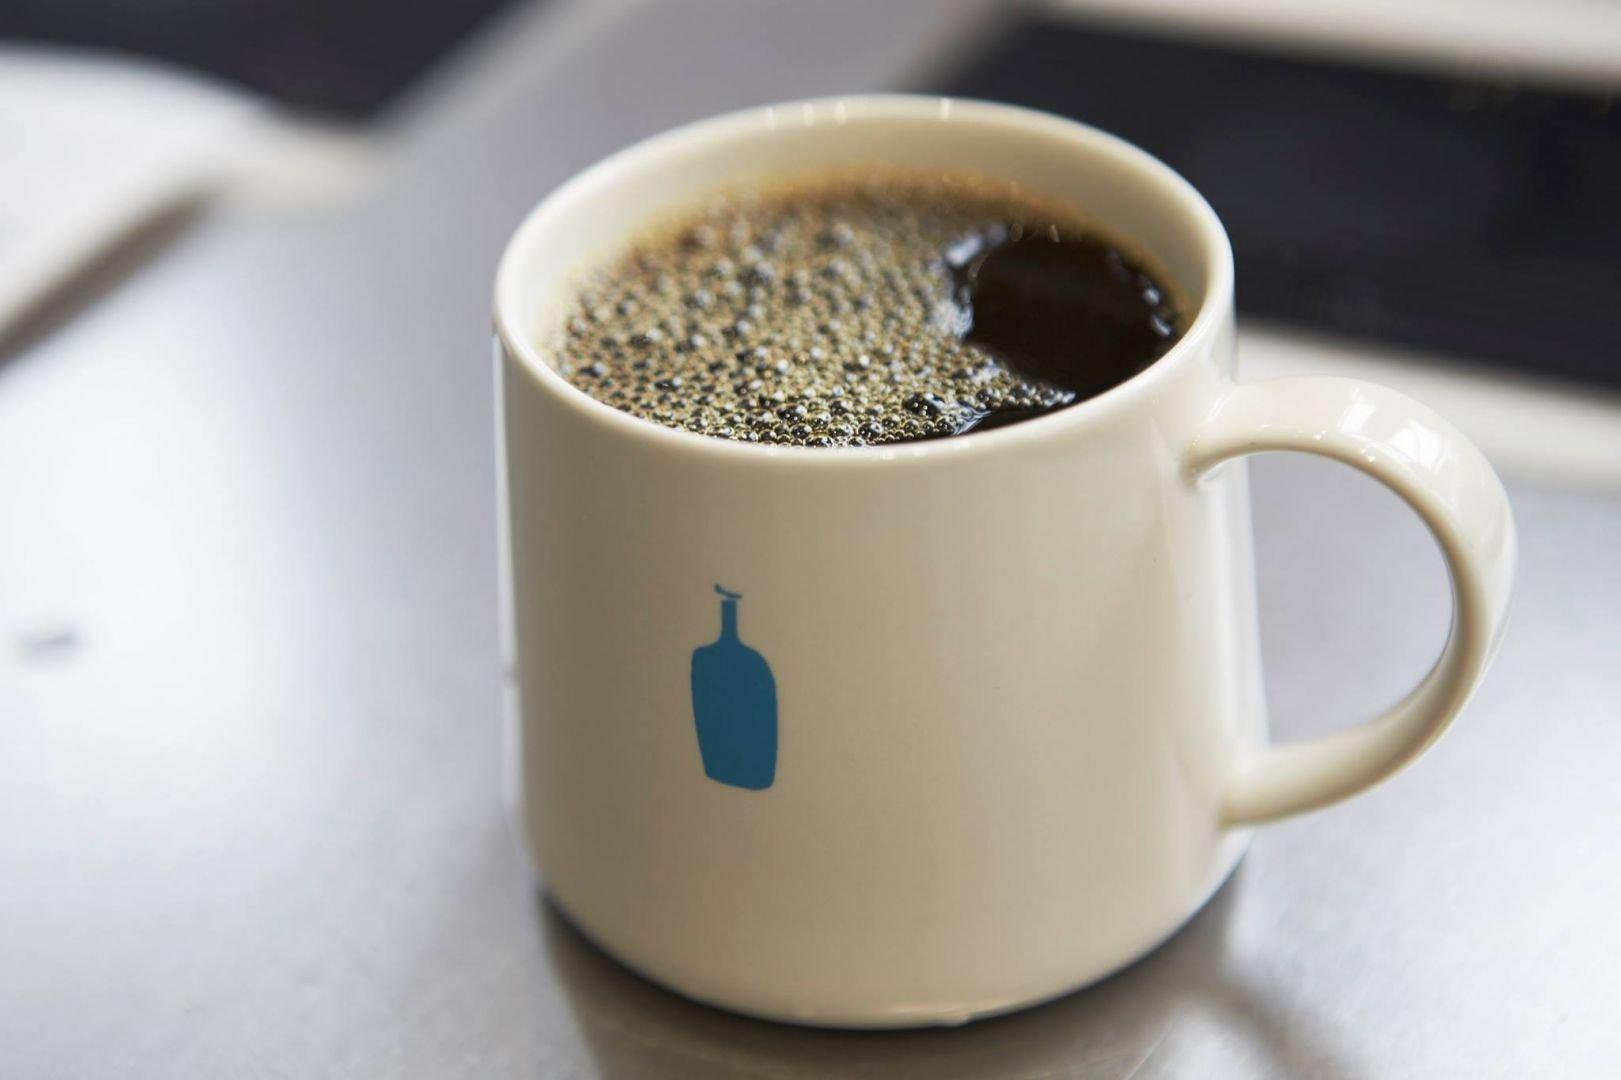 img 5aa9b4bdee32f - Blue Bottle藍瓶咖啡京都店下週熱烈開幕:獨家抹茶餅乾、多款限定商品!